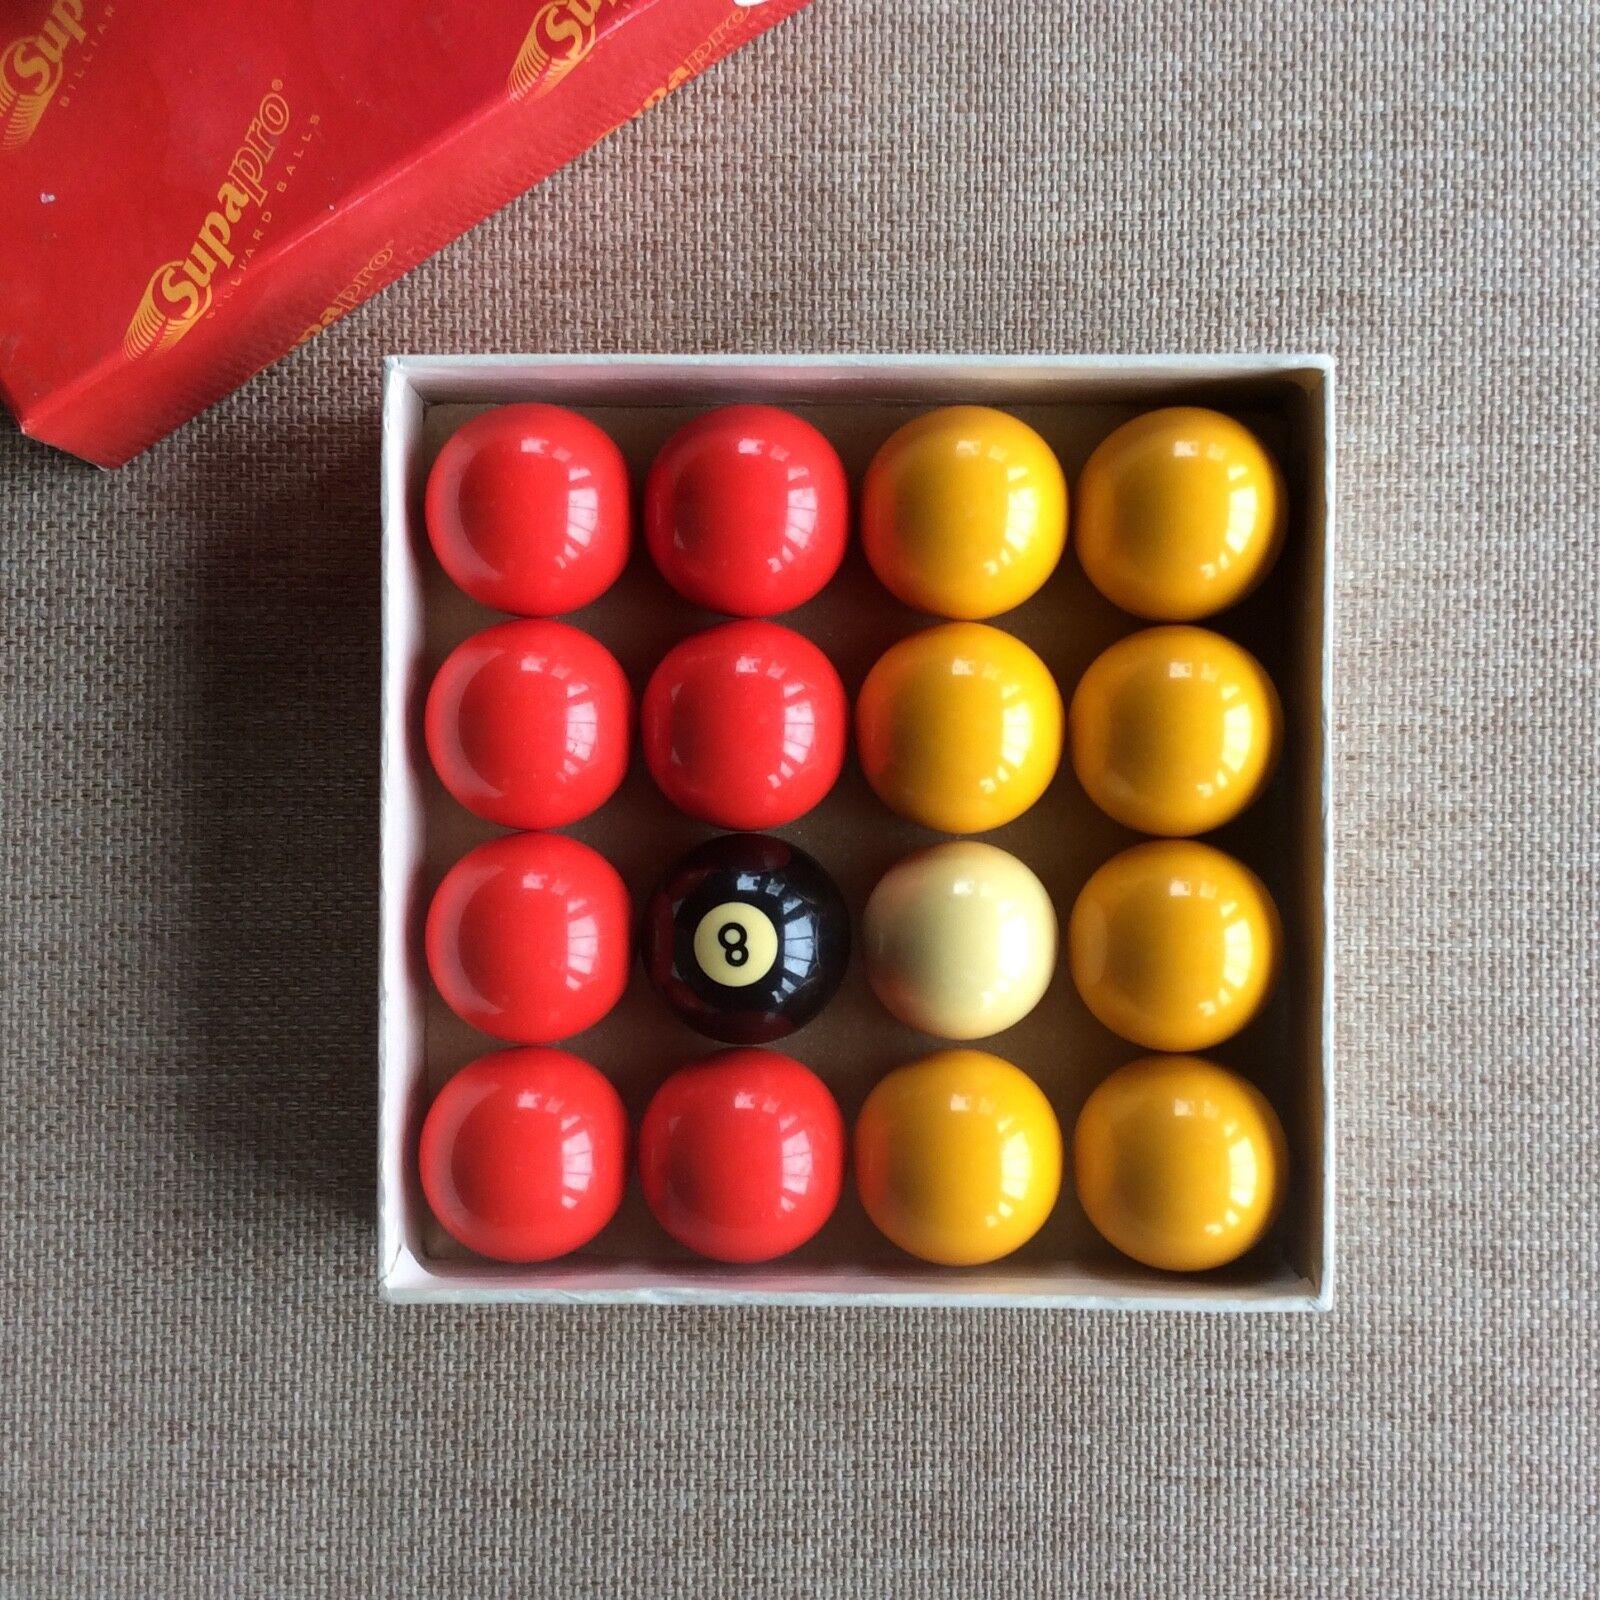 Supapro Billiard Balls / Pool Balls / Style 3112T 2